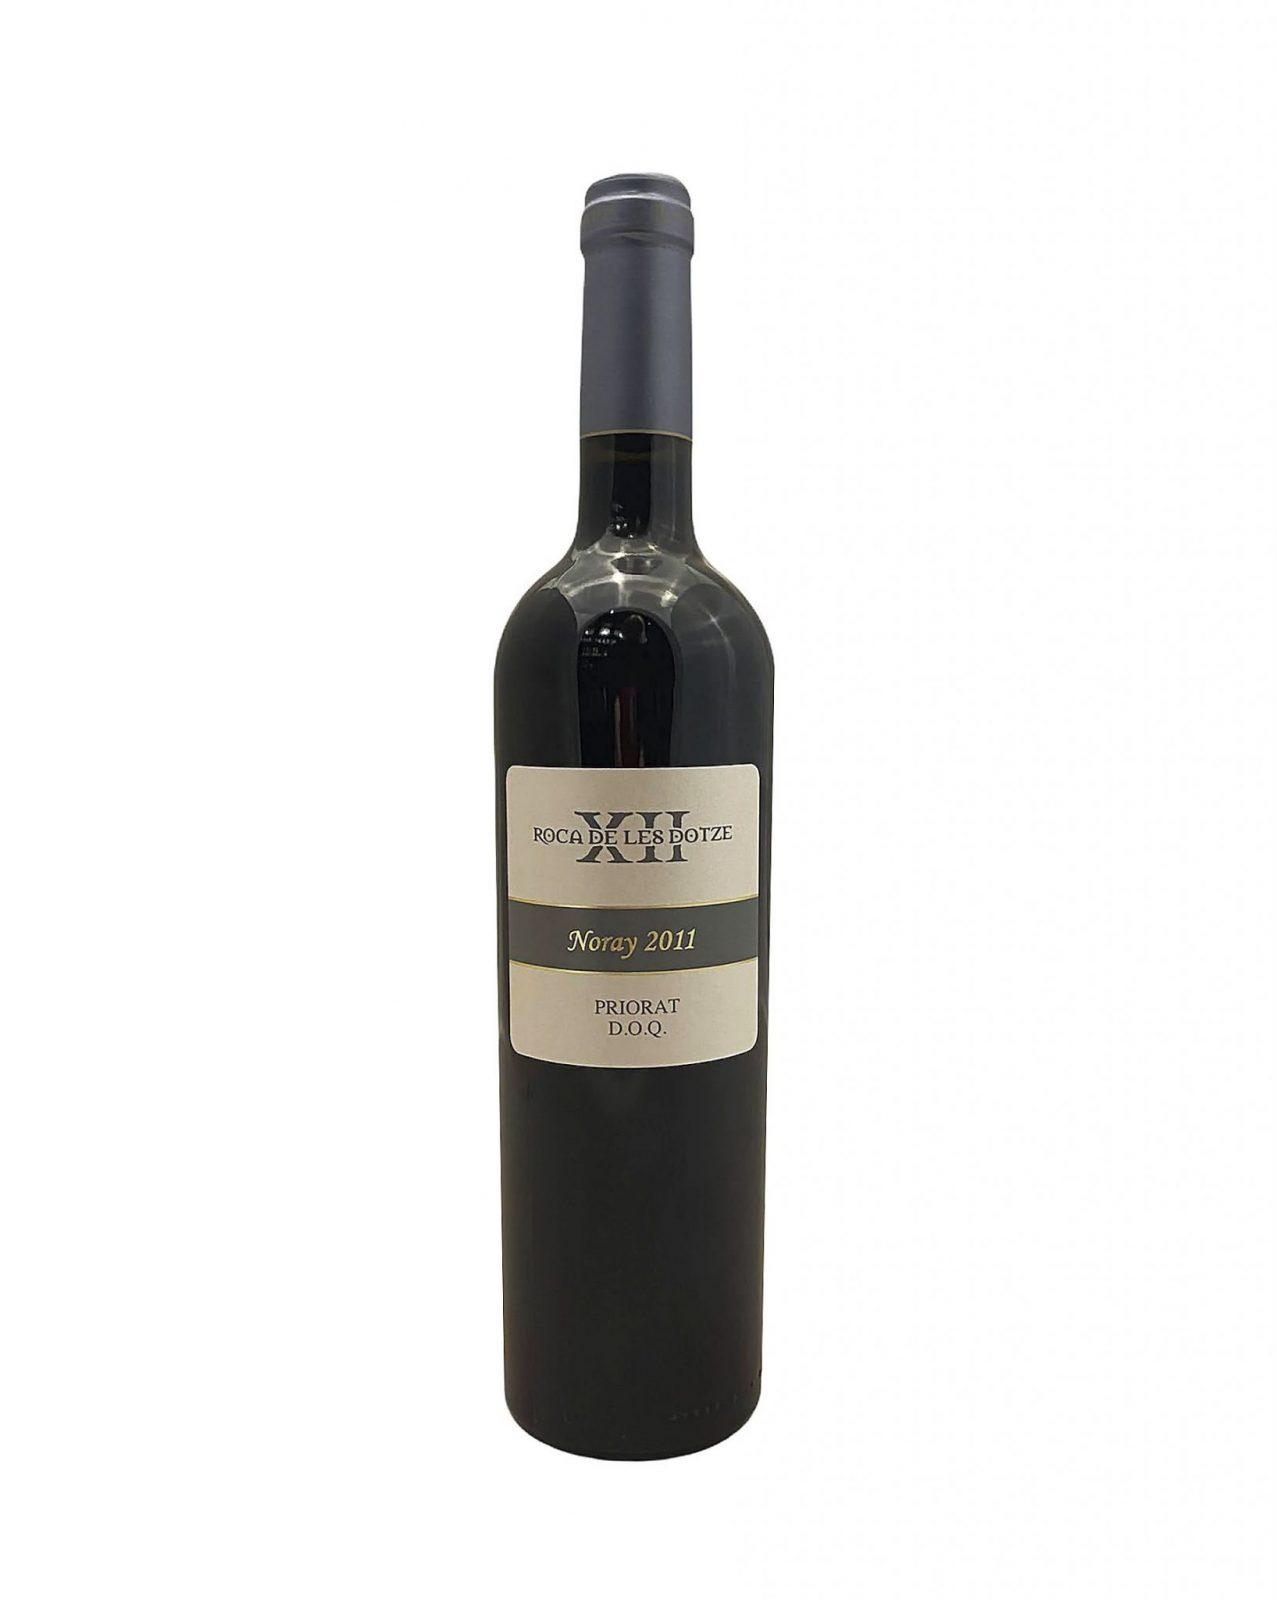 ROCA DE LES DOTZE – Noray 2011, Červené víno, vinotéka Sunny wines, slnecnice mesto Bratislava, rozvoz vina, francúzske víno